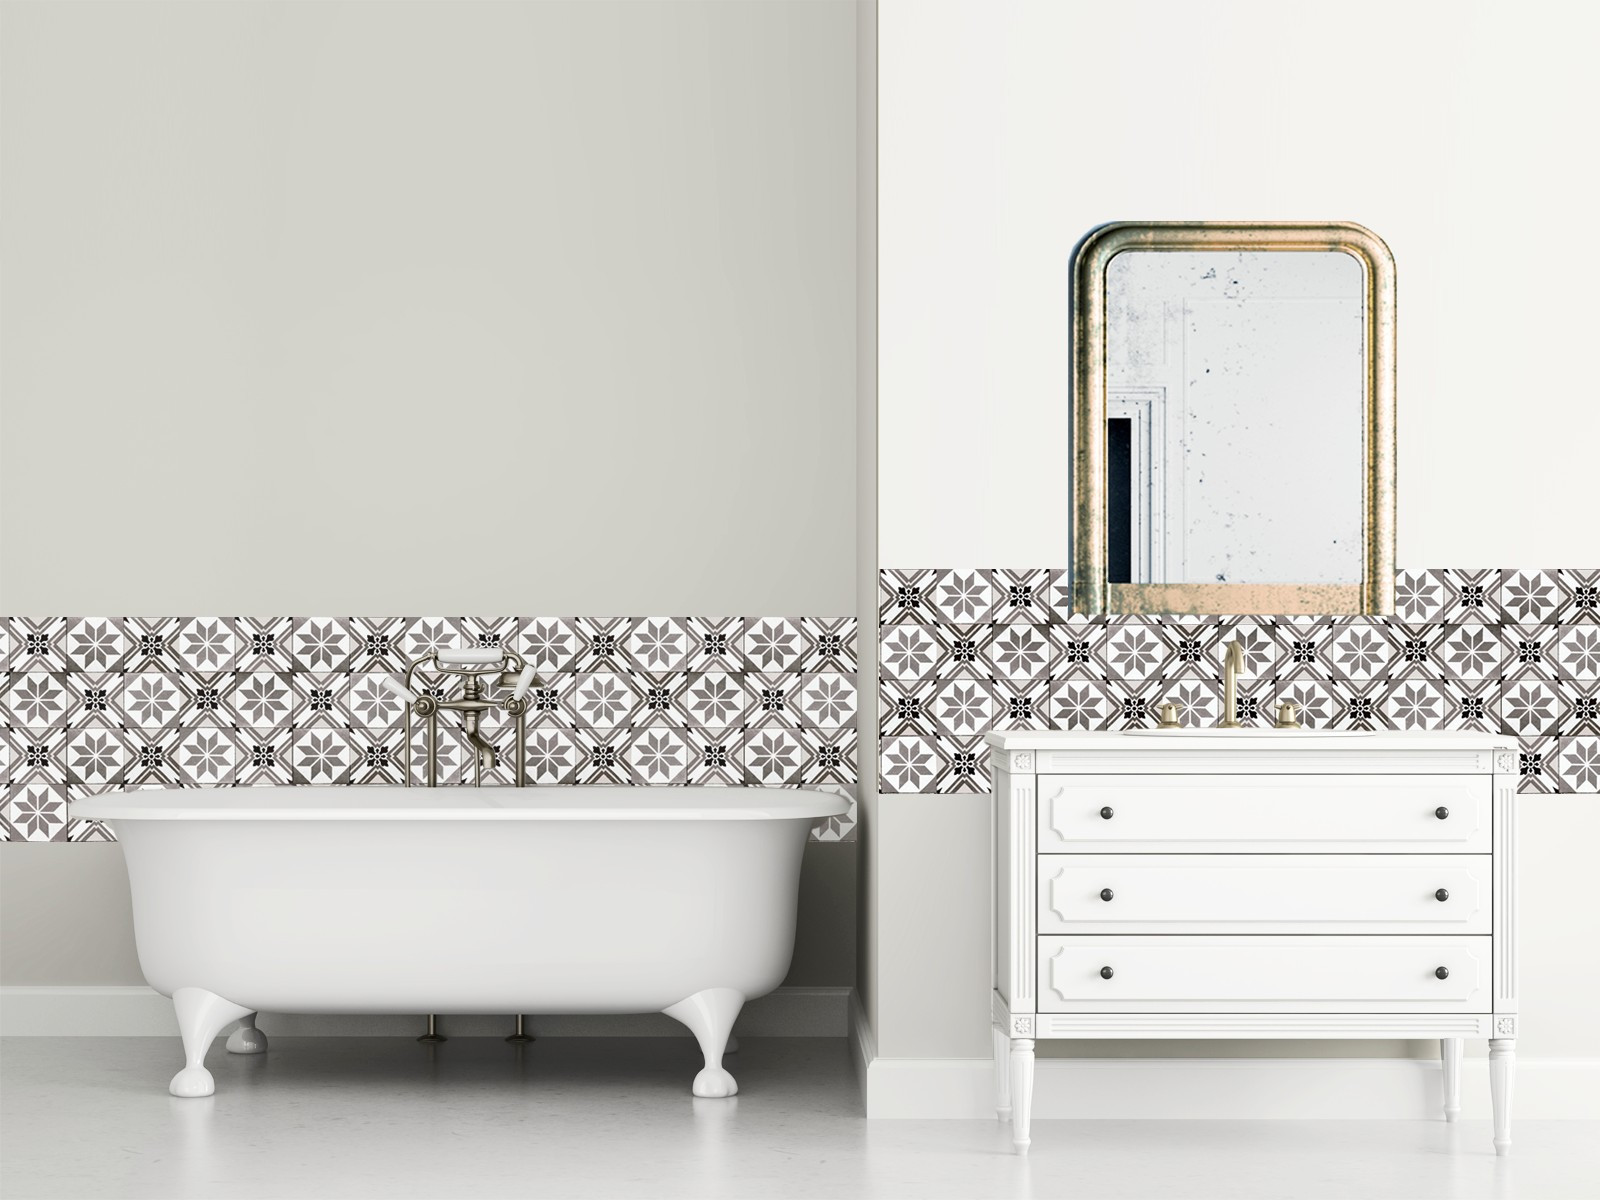 cr dence adh sive carreaux de ciment cadix greige. Black Bedroom Furniture Sets. Home Design Ideas